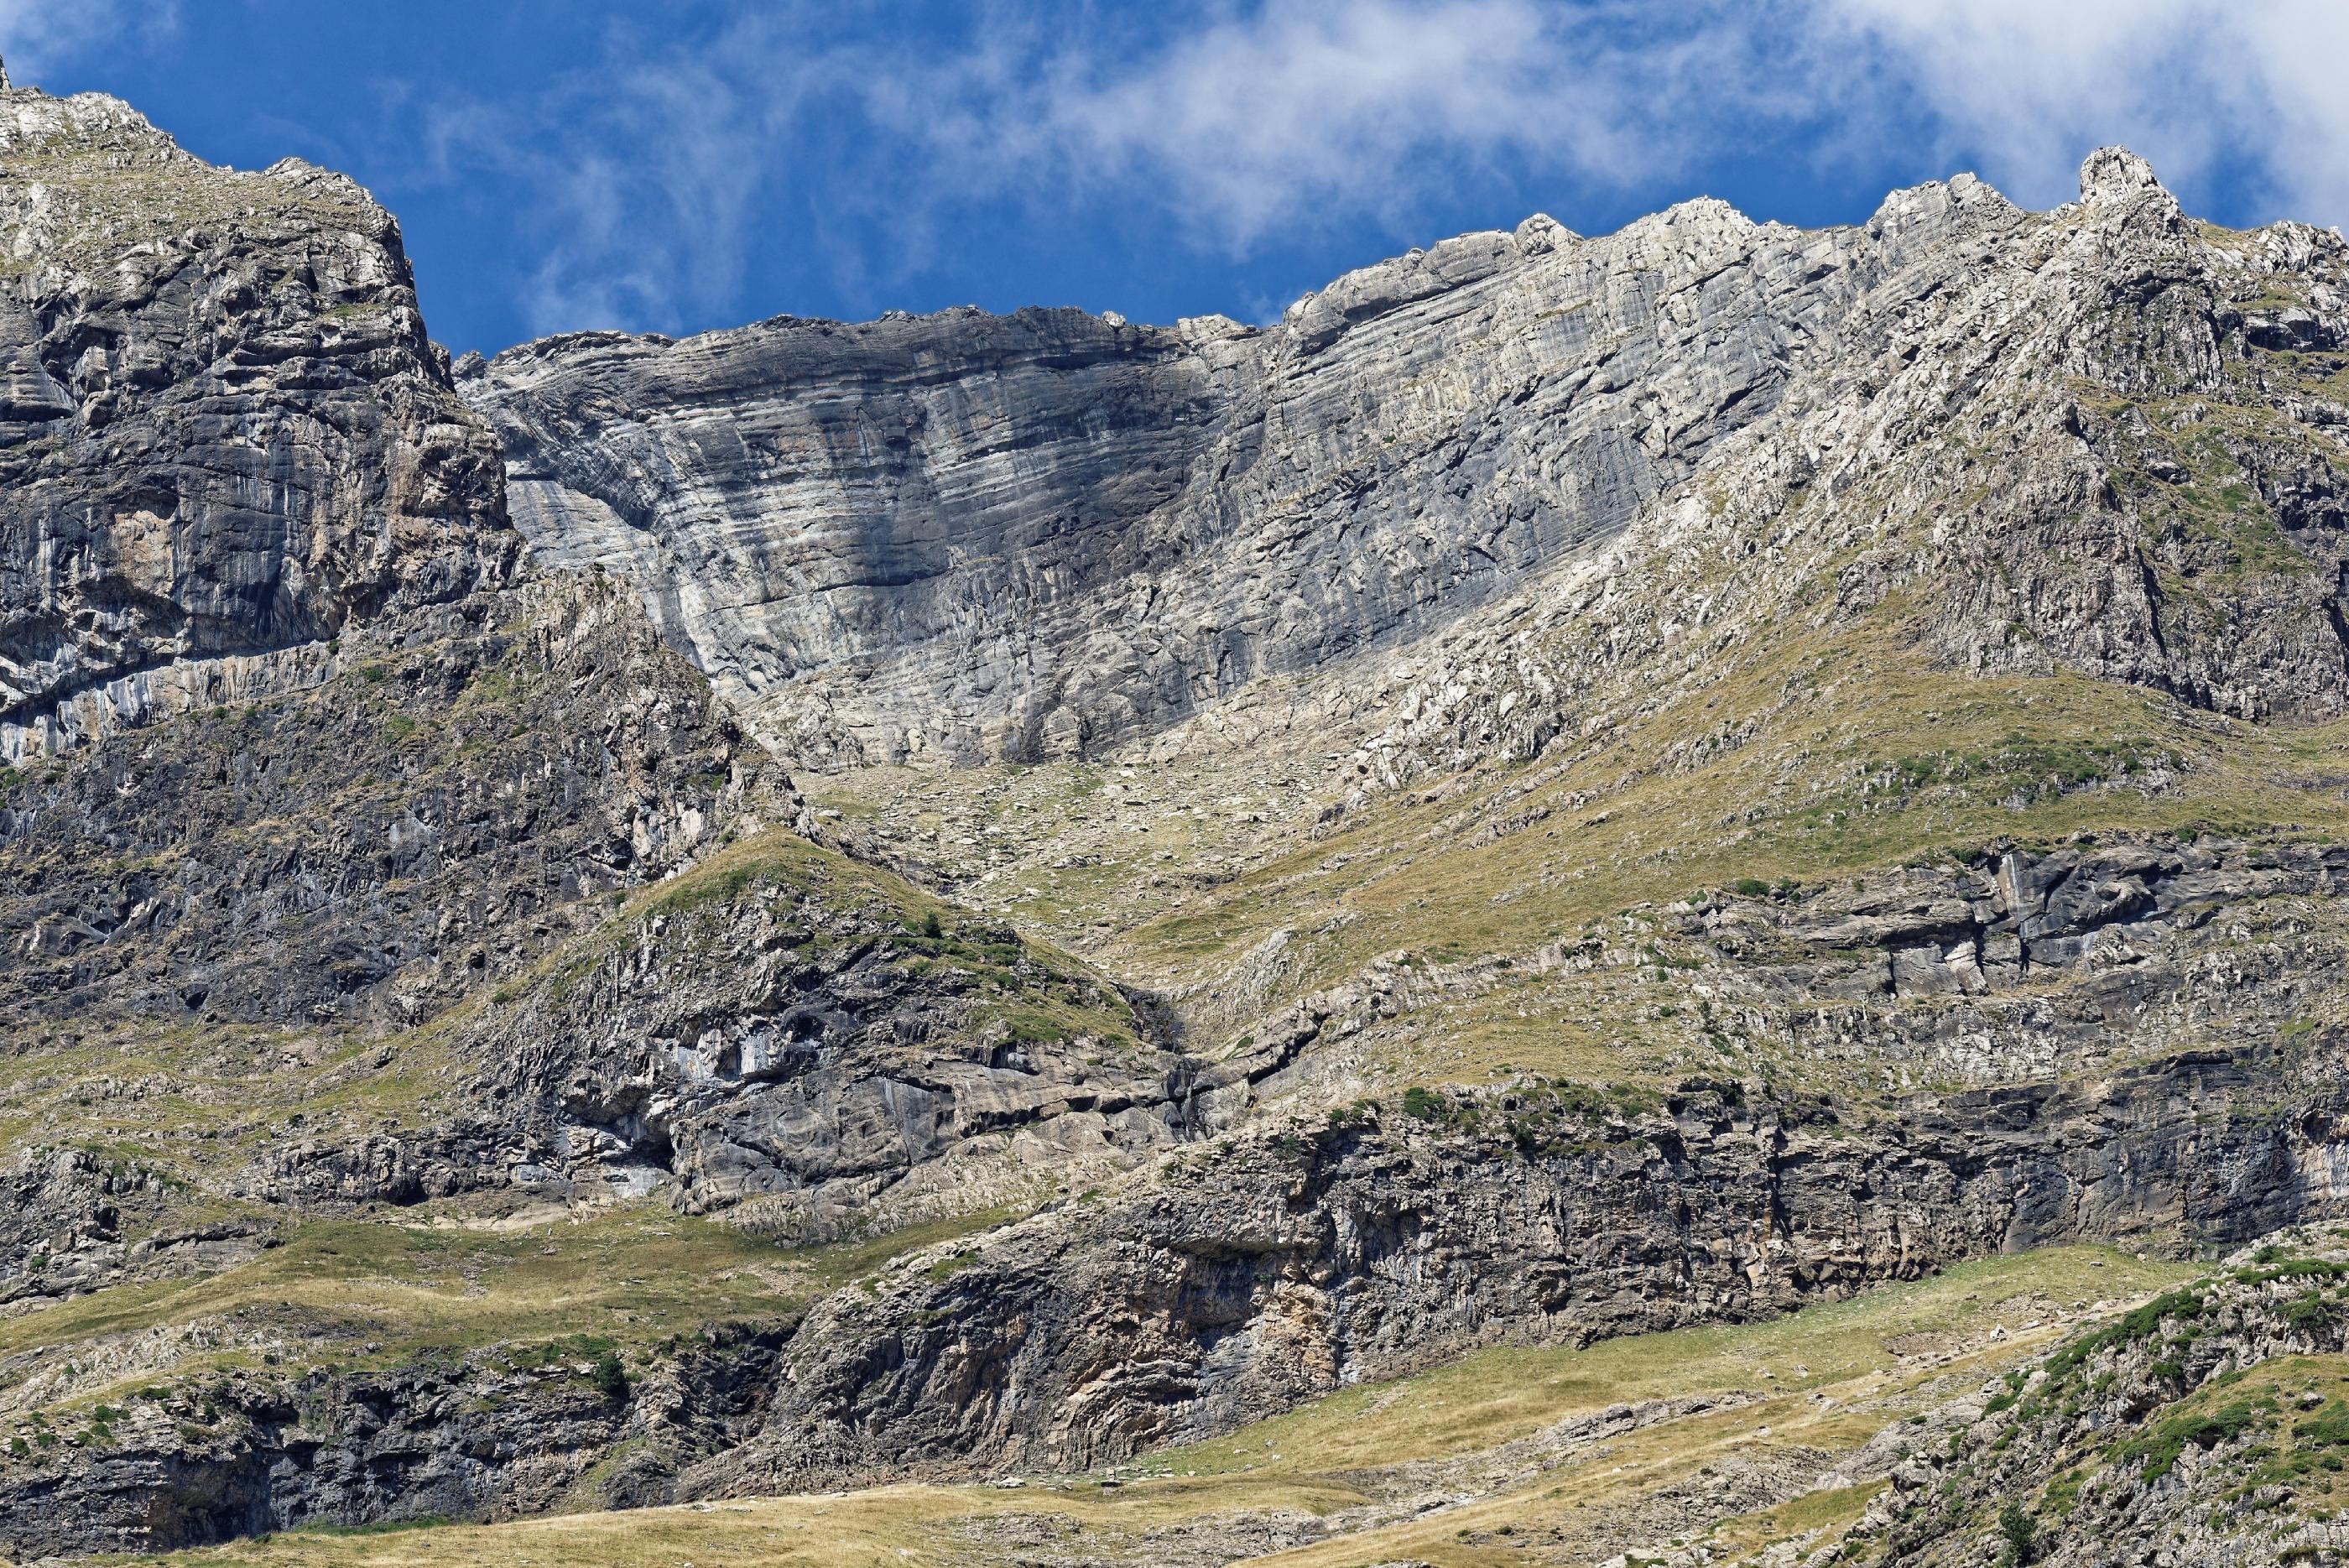 160910-marche-cascade-du-cinca-et-de-la-larri-sobrarbe-aragon-117